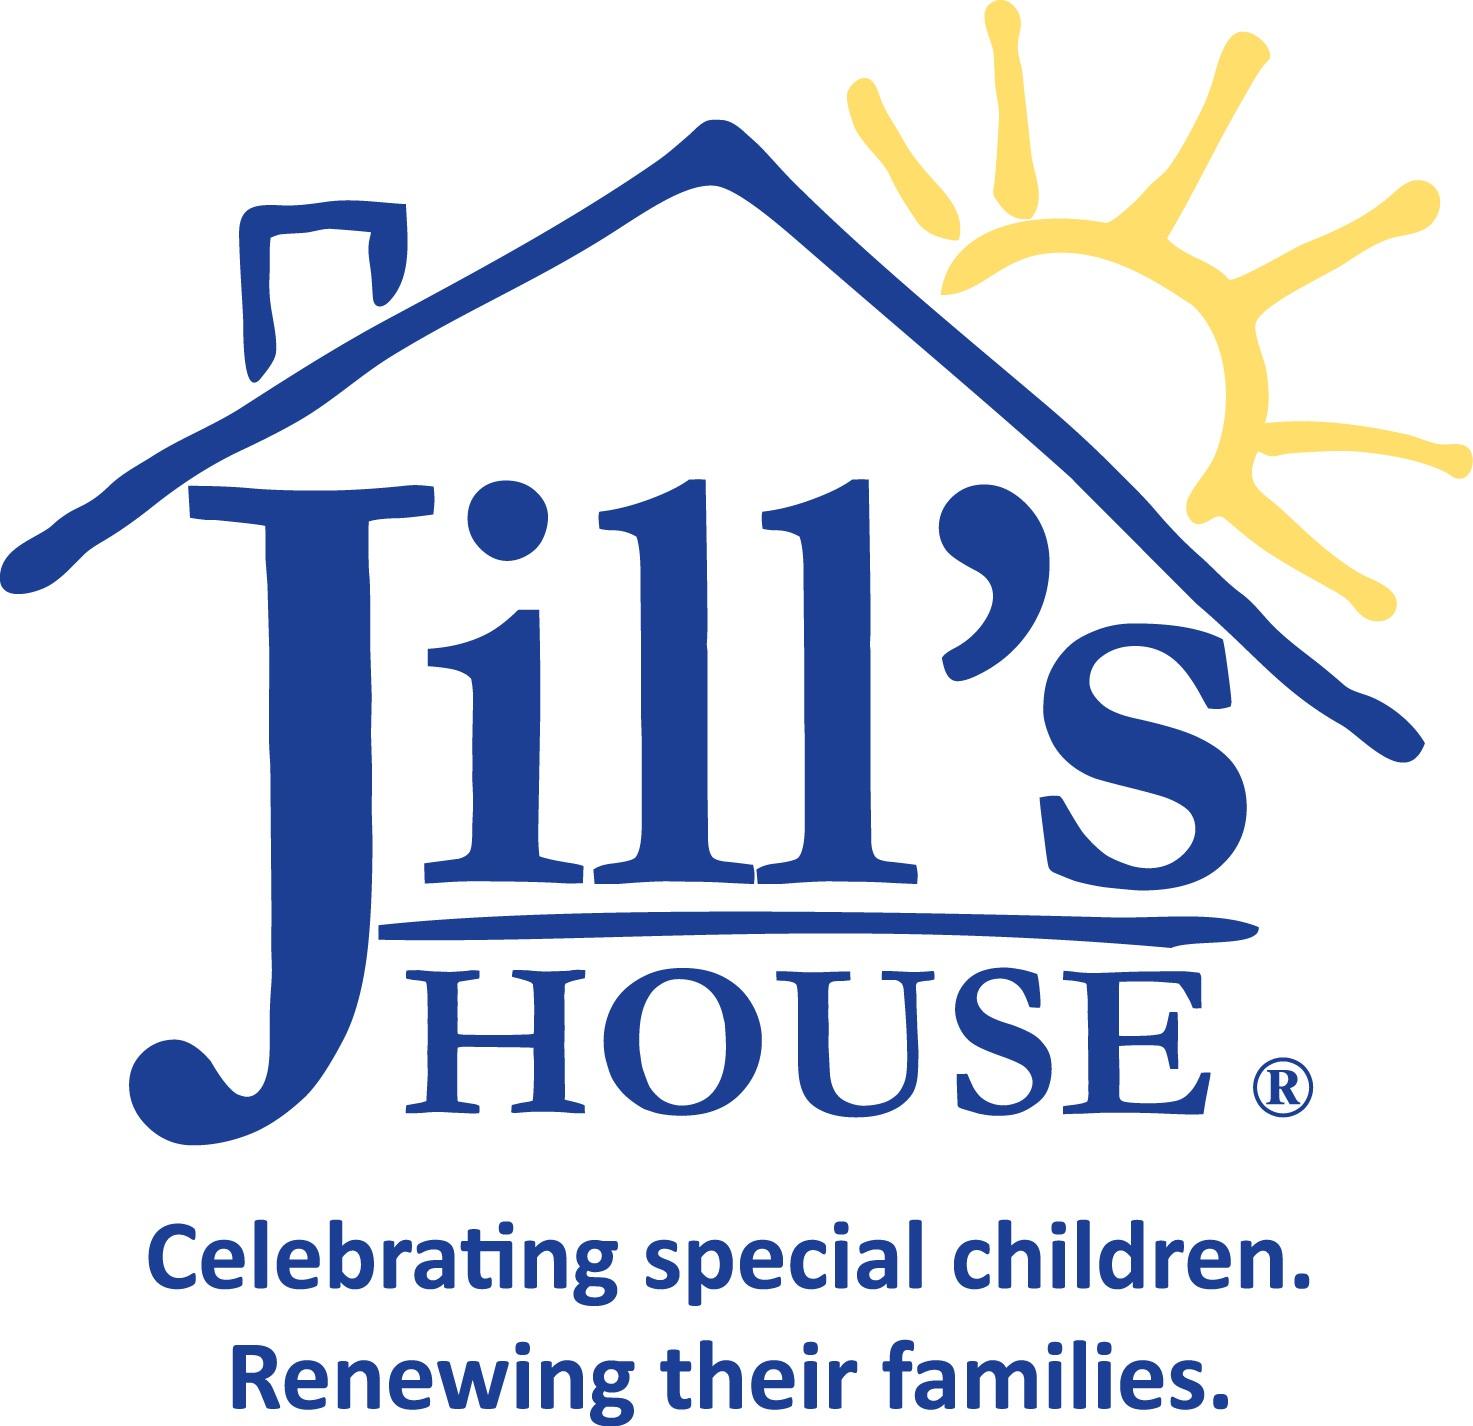 Jills House Logo